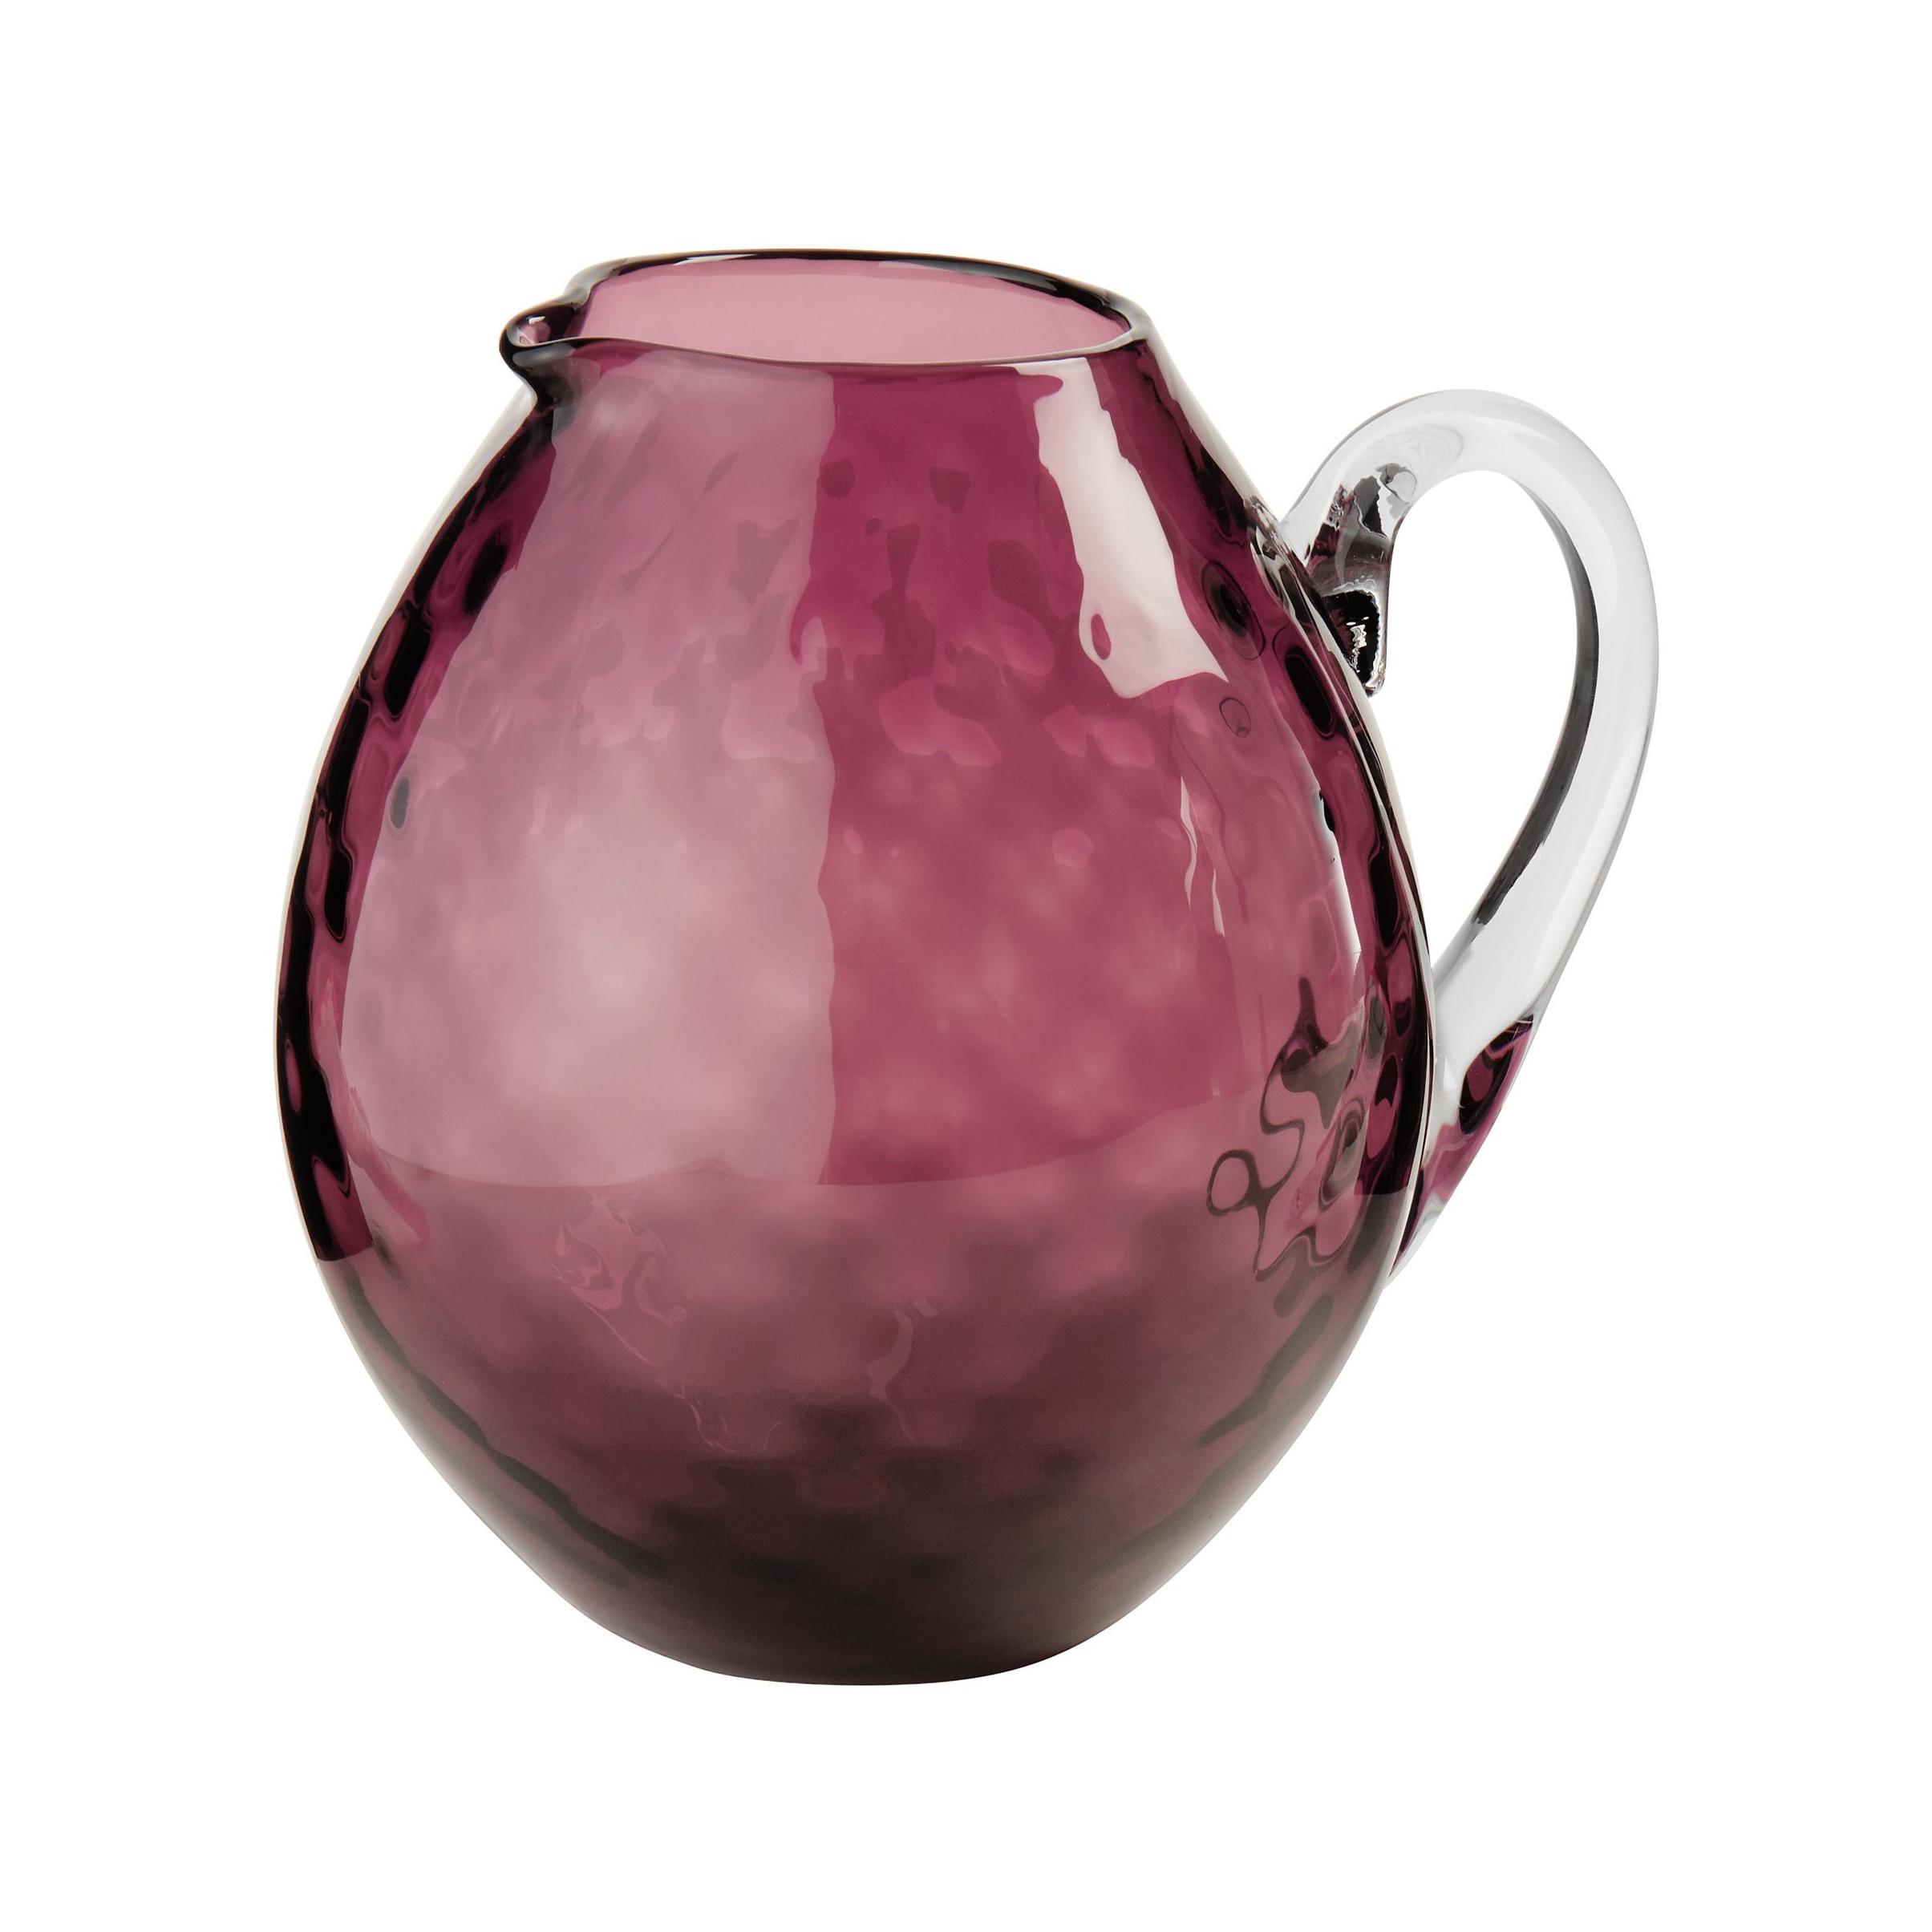 Rogaska Crystal Vase Patterns Of Luxury Fine Cut Crystal Glassware Glasses William son Inside Nasonmoretti Jug